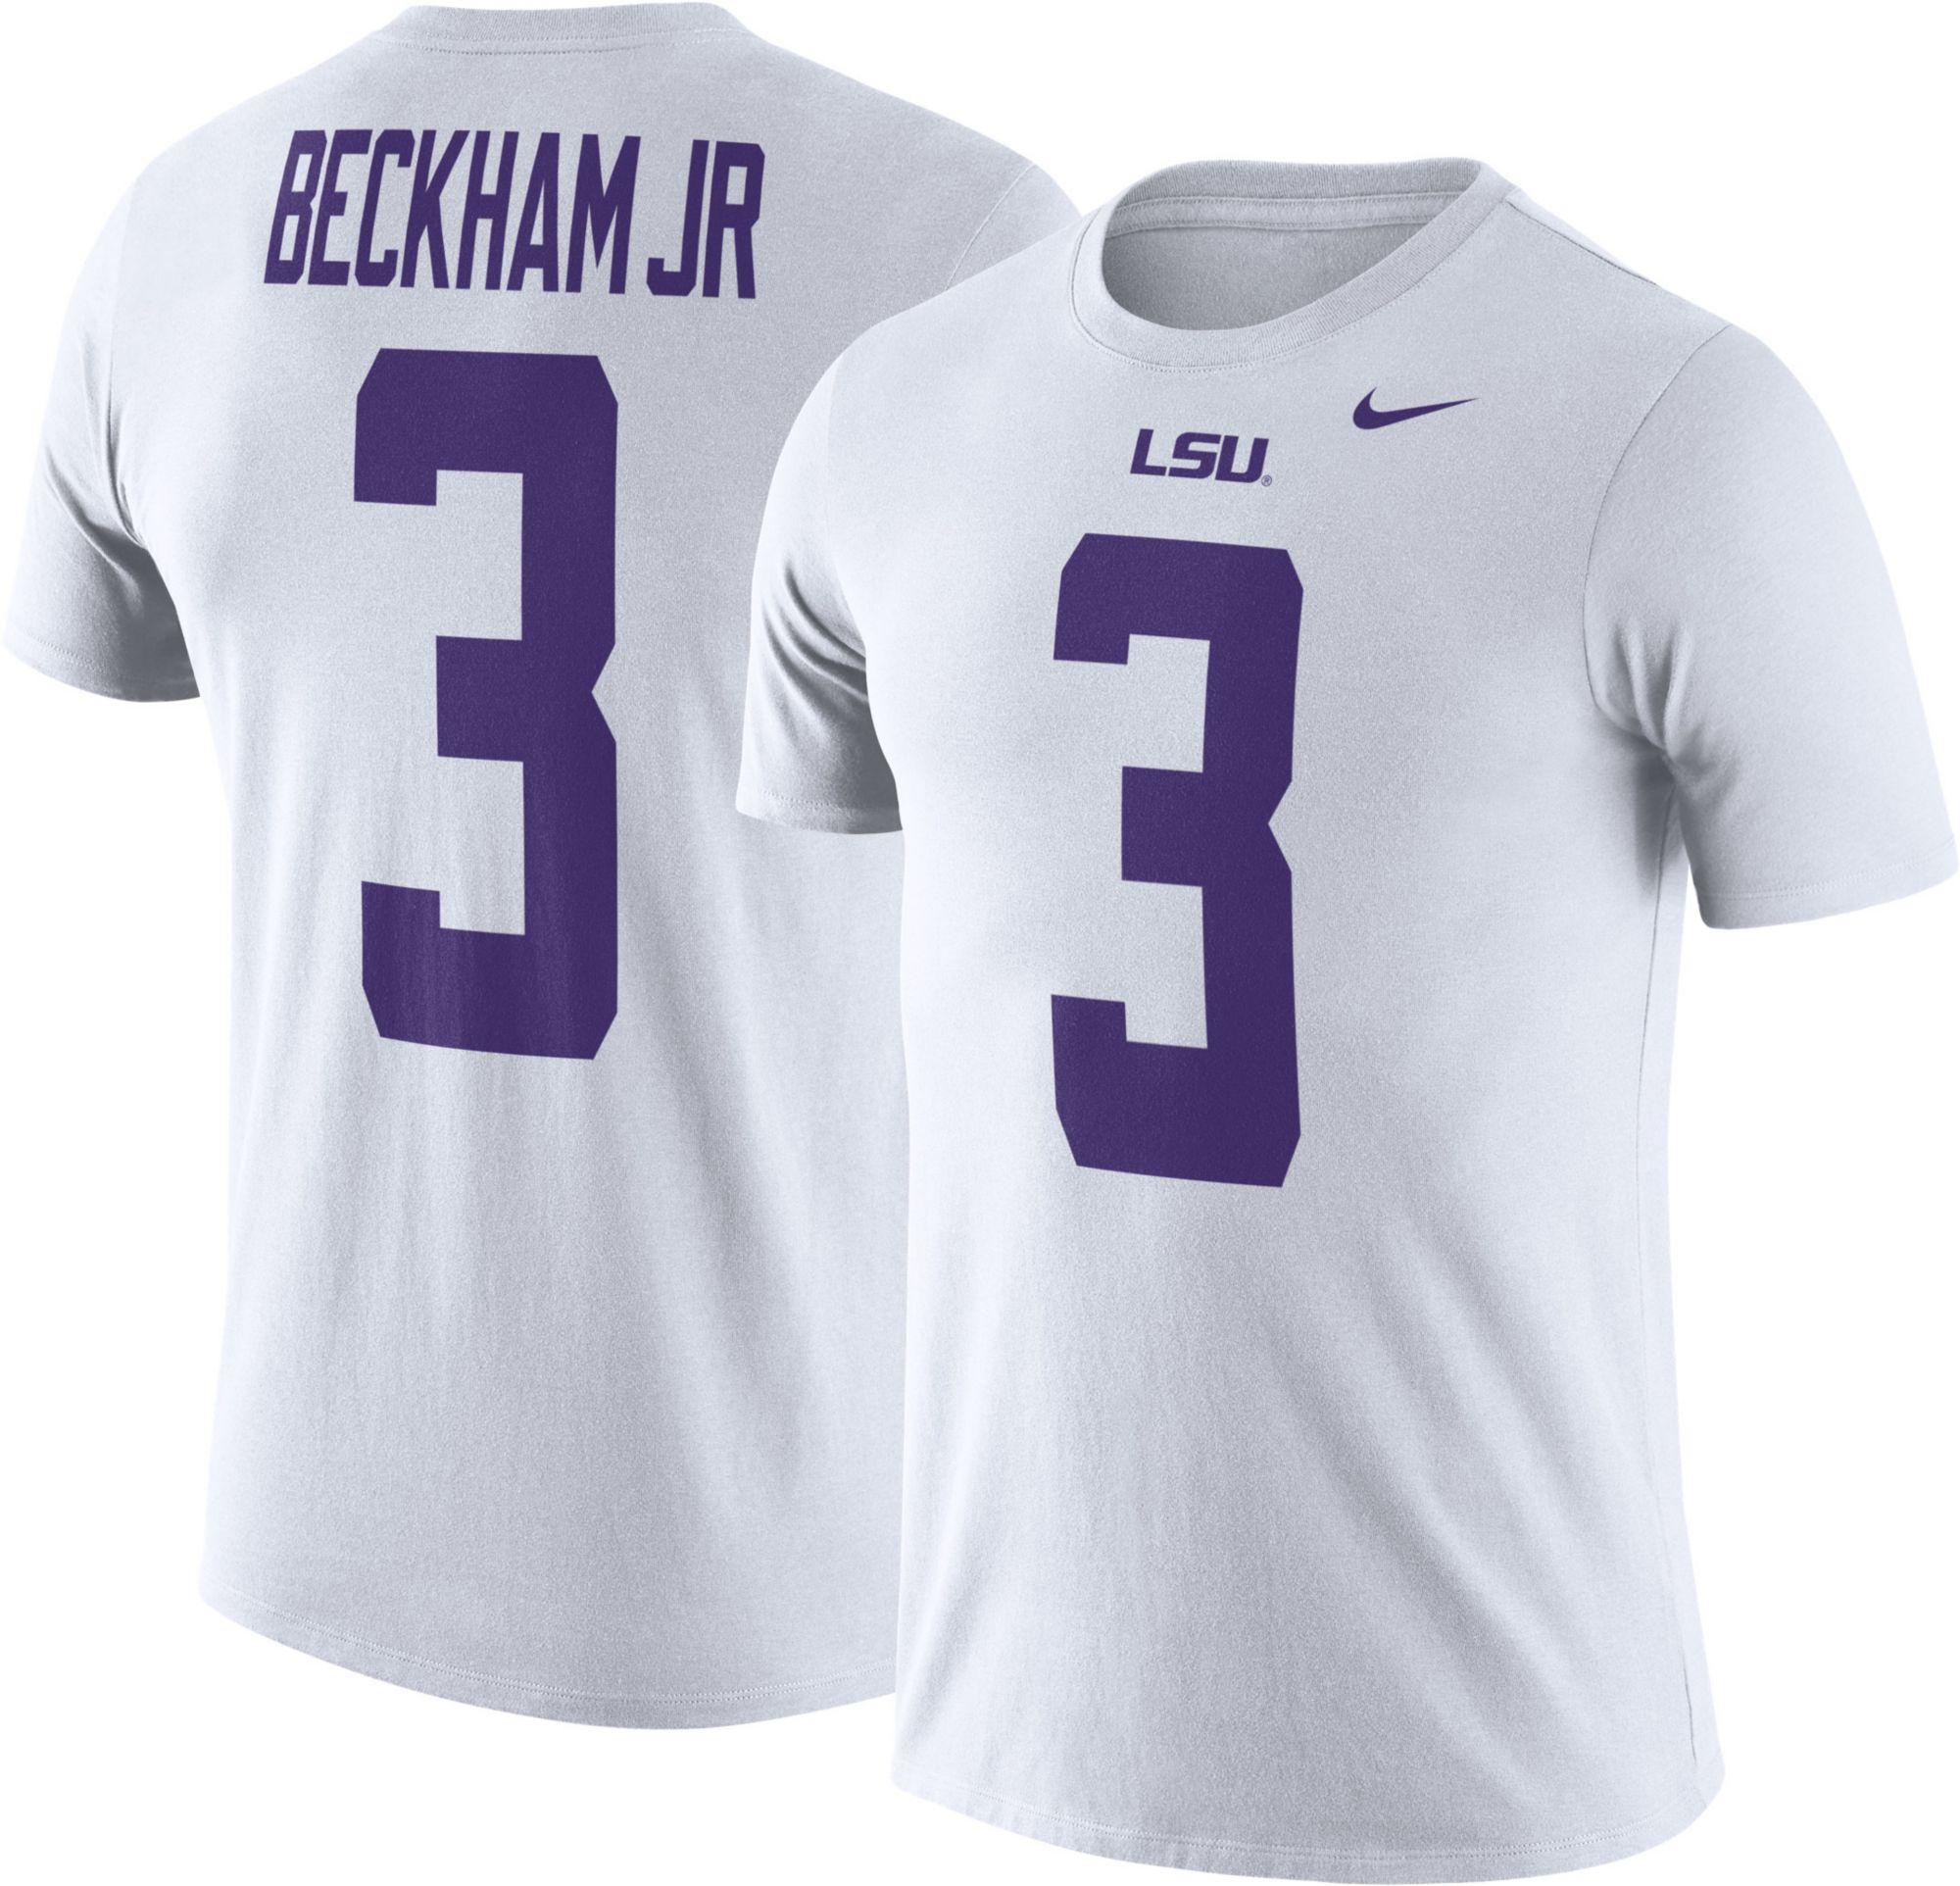 ecb6cdc3575 ... college jerseys 329e6 0c97c; australia nike mens lsu tigers odell  beckham jr. 3 white future star replica football jersey